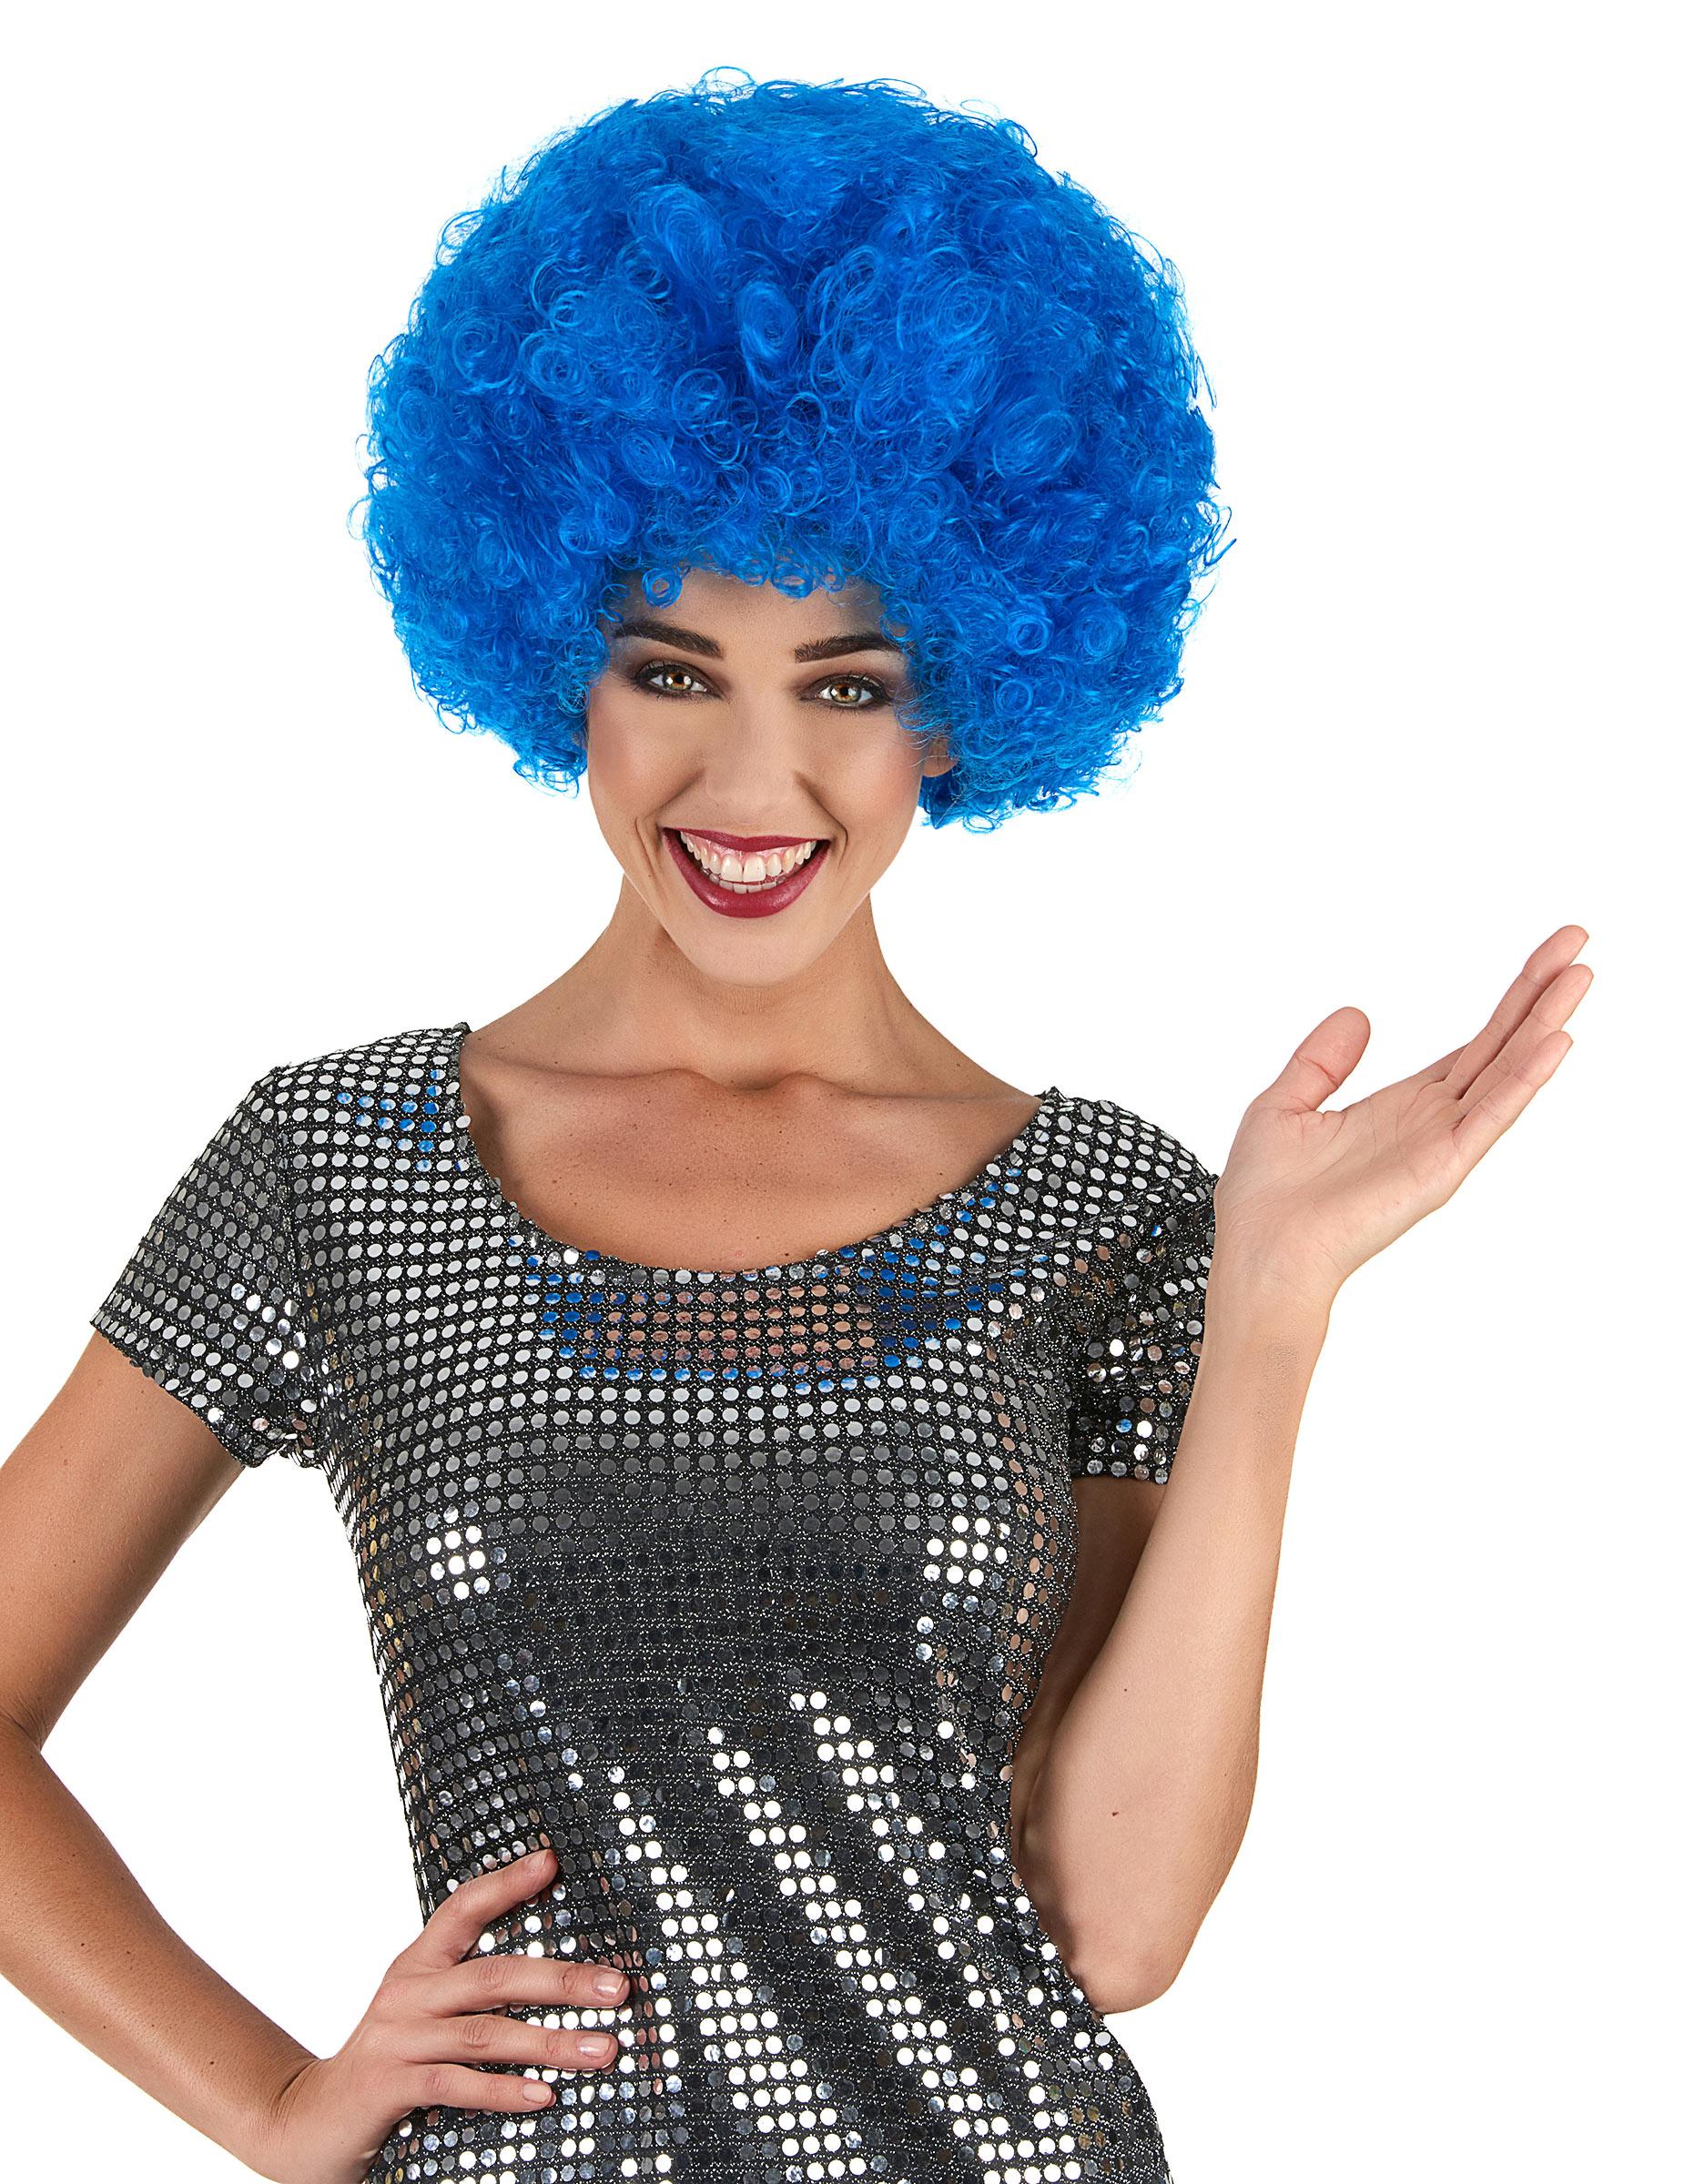 blu Parrucche adulto confort e clown afro Parrucca vestiti disco di qUwtUv